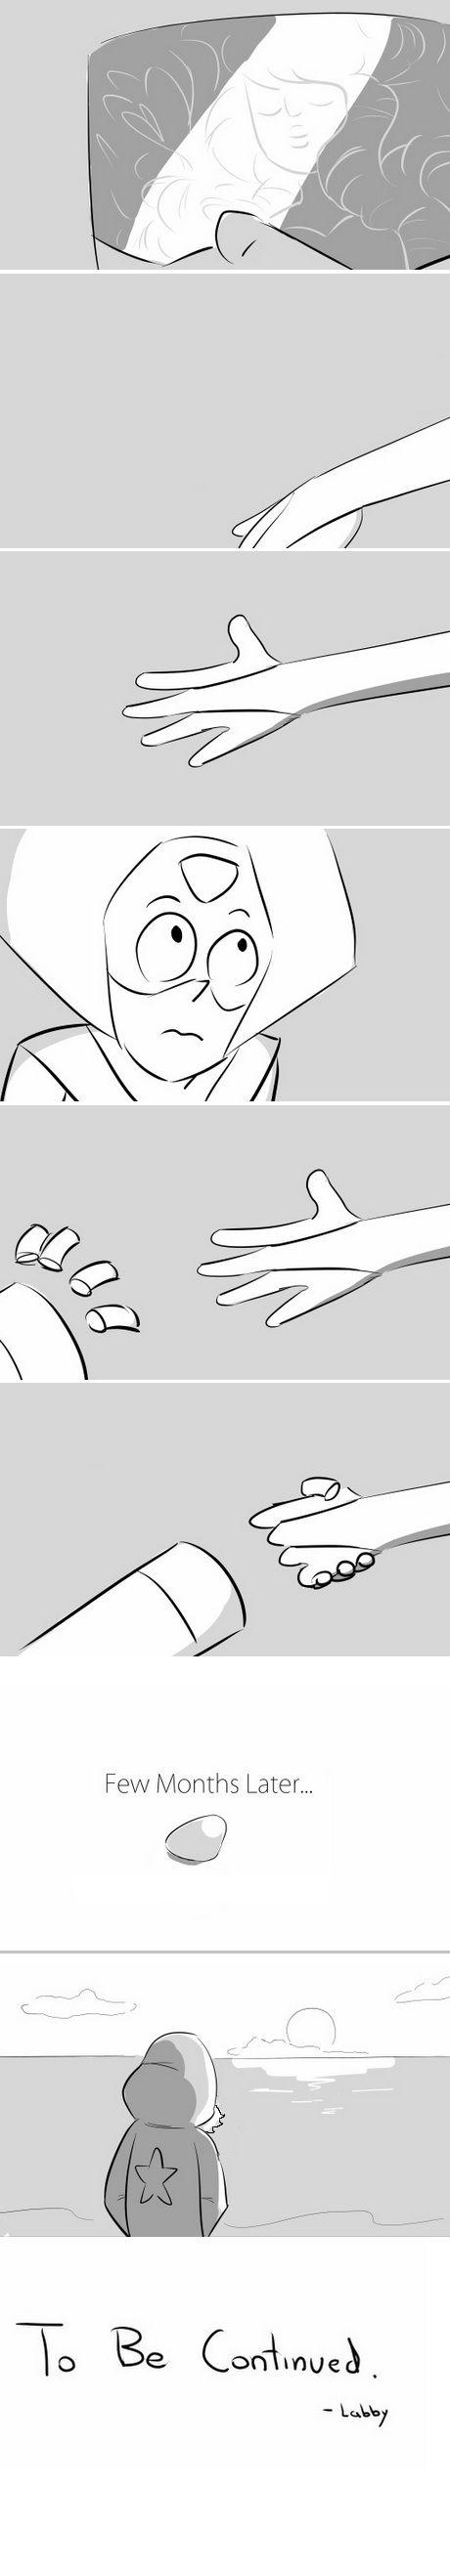 Steven Universe Comic Peridot's Redemption Part 16 by AbbitraryLabby.deviantart.com on @DeviantArt